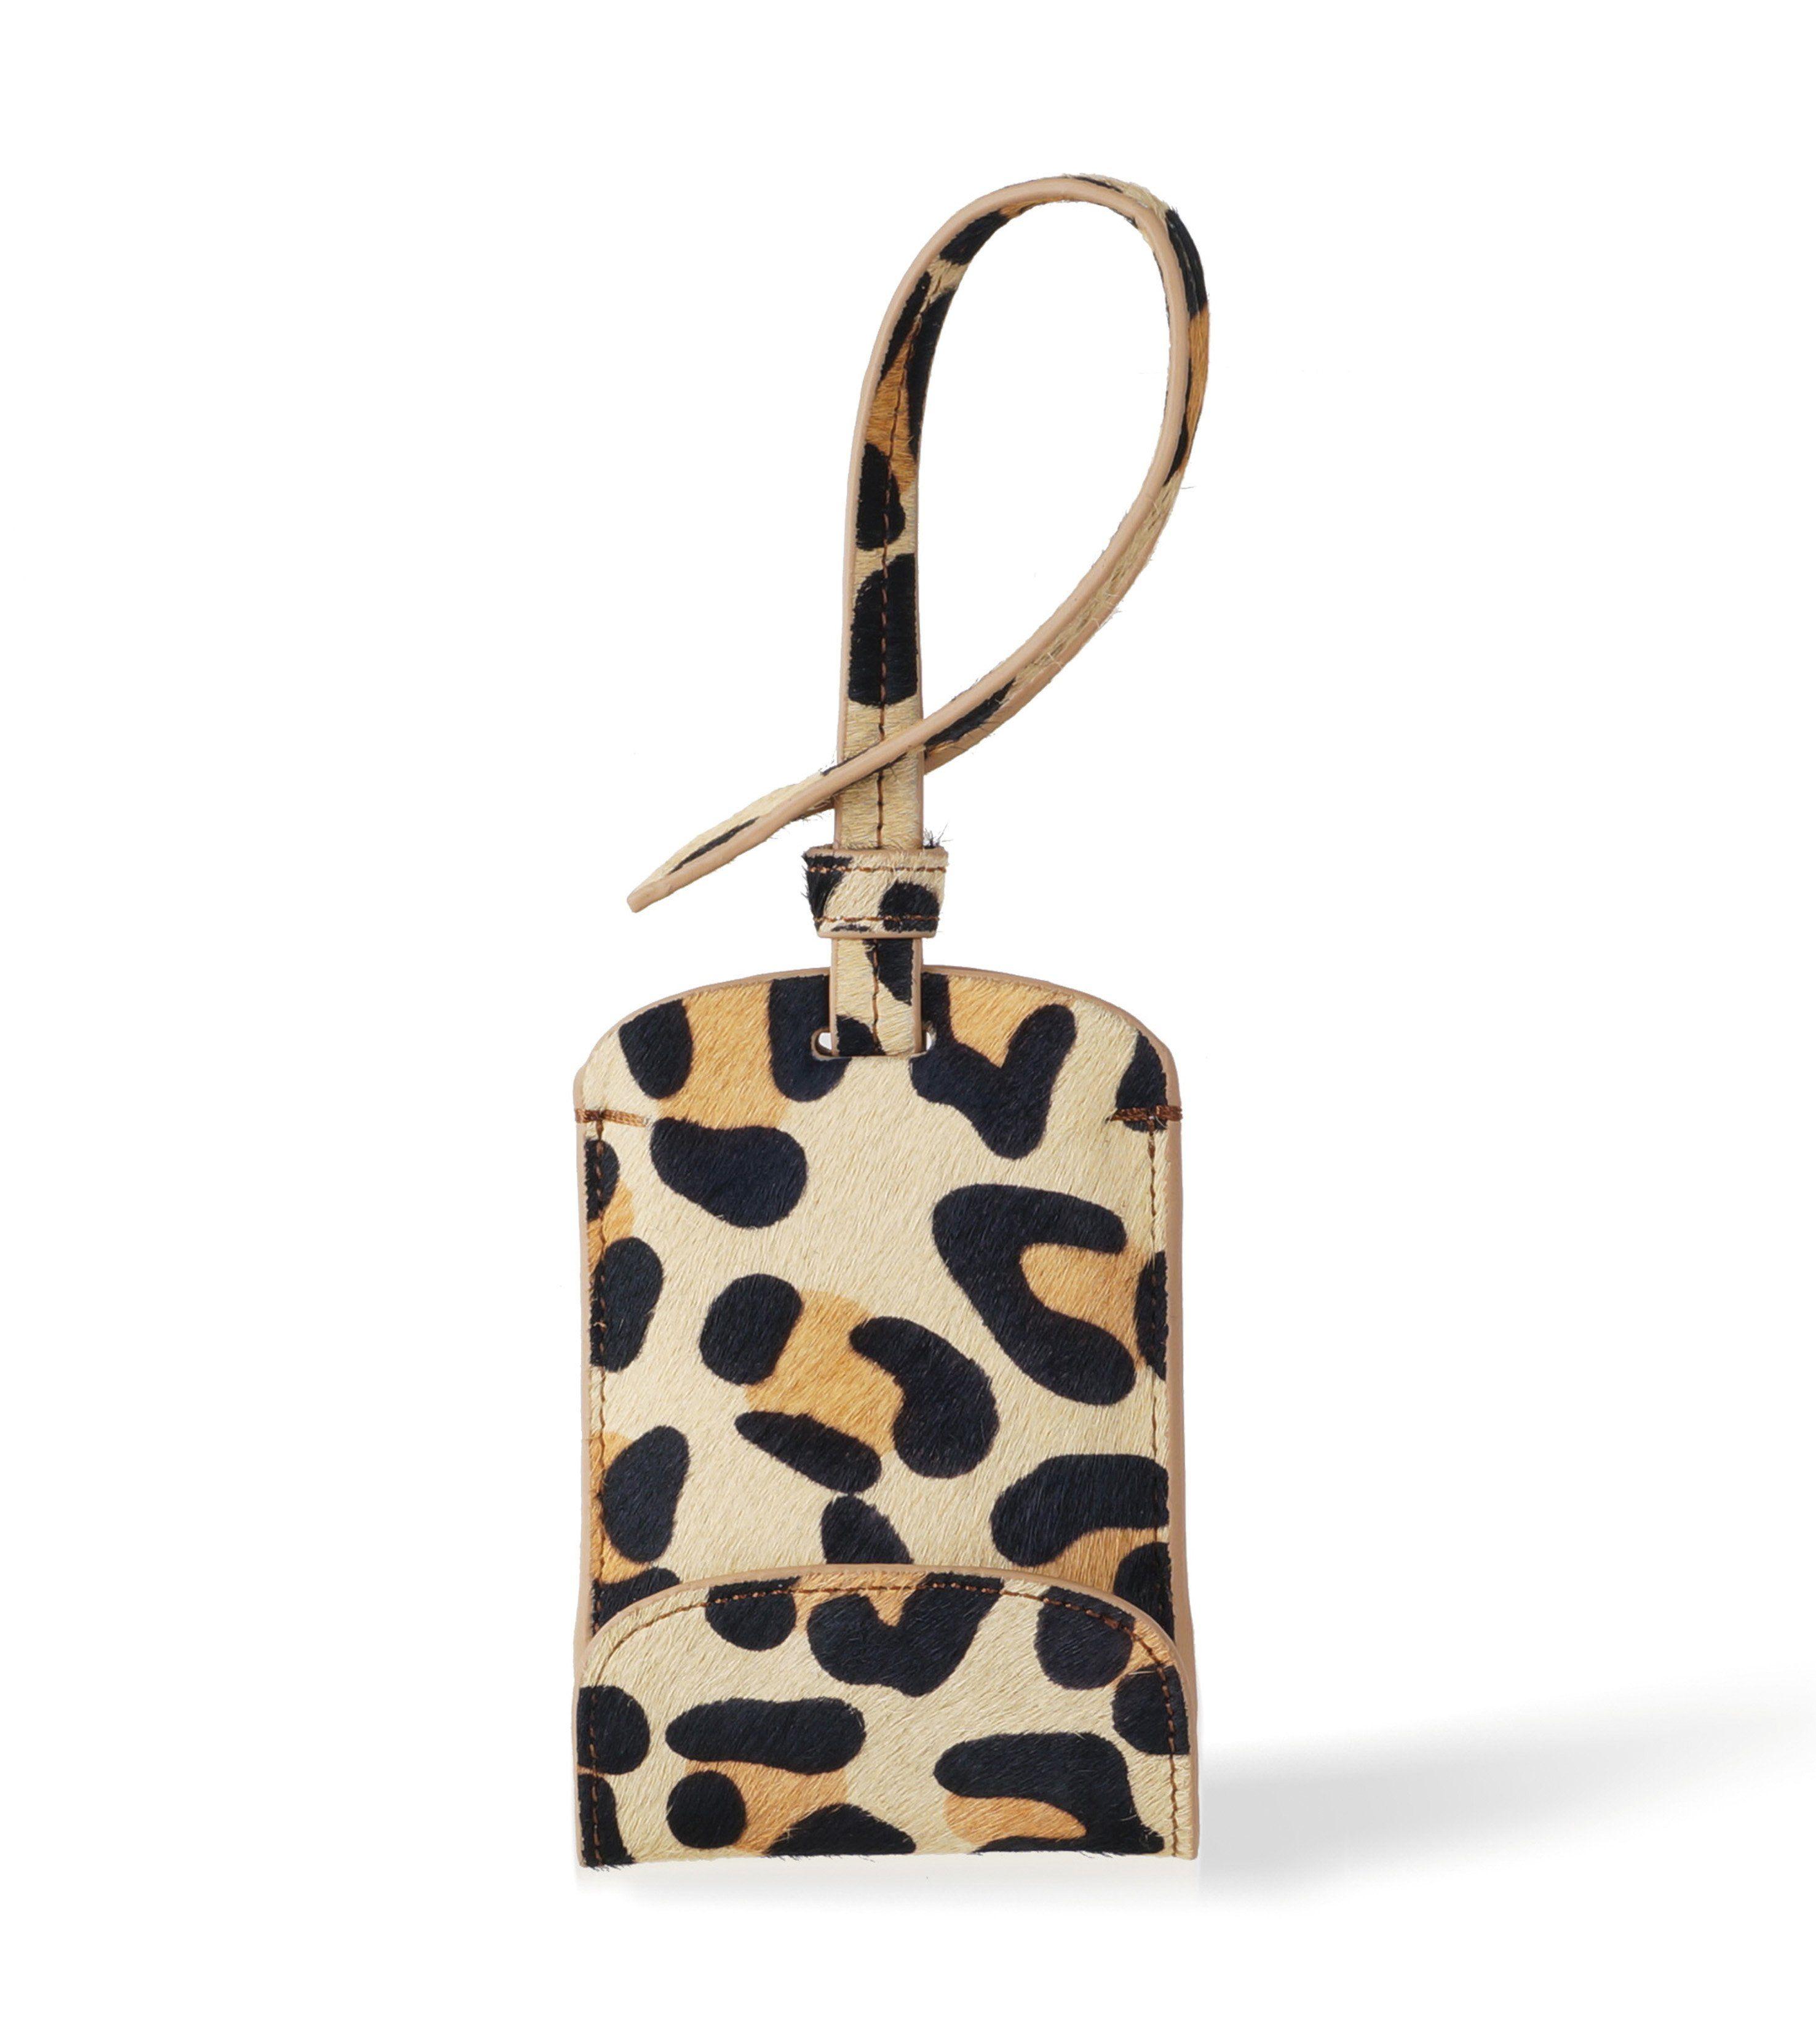 Fancy - Leopard Bag Tag Smartphone Charger